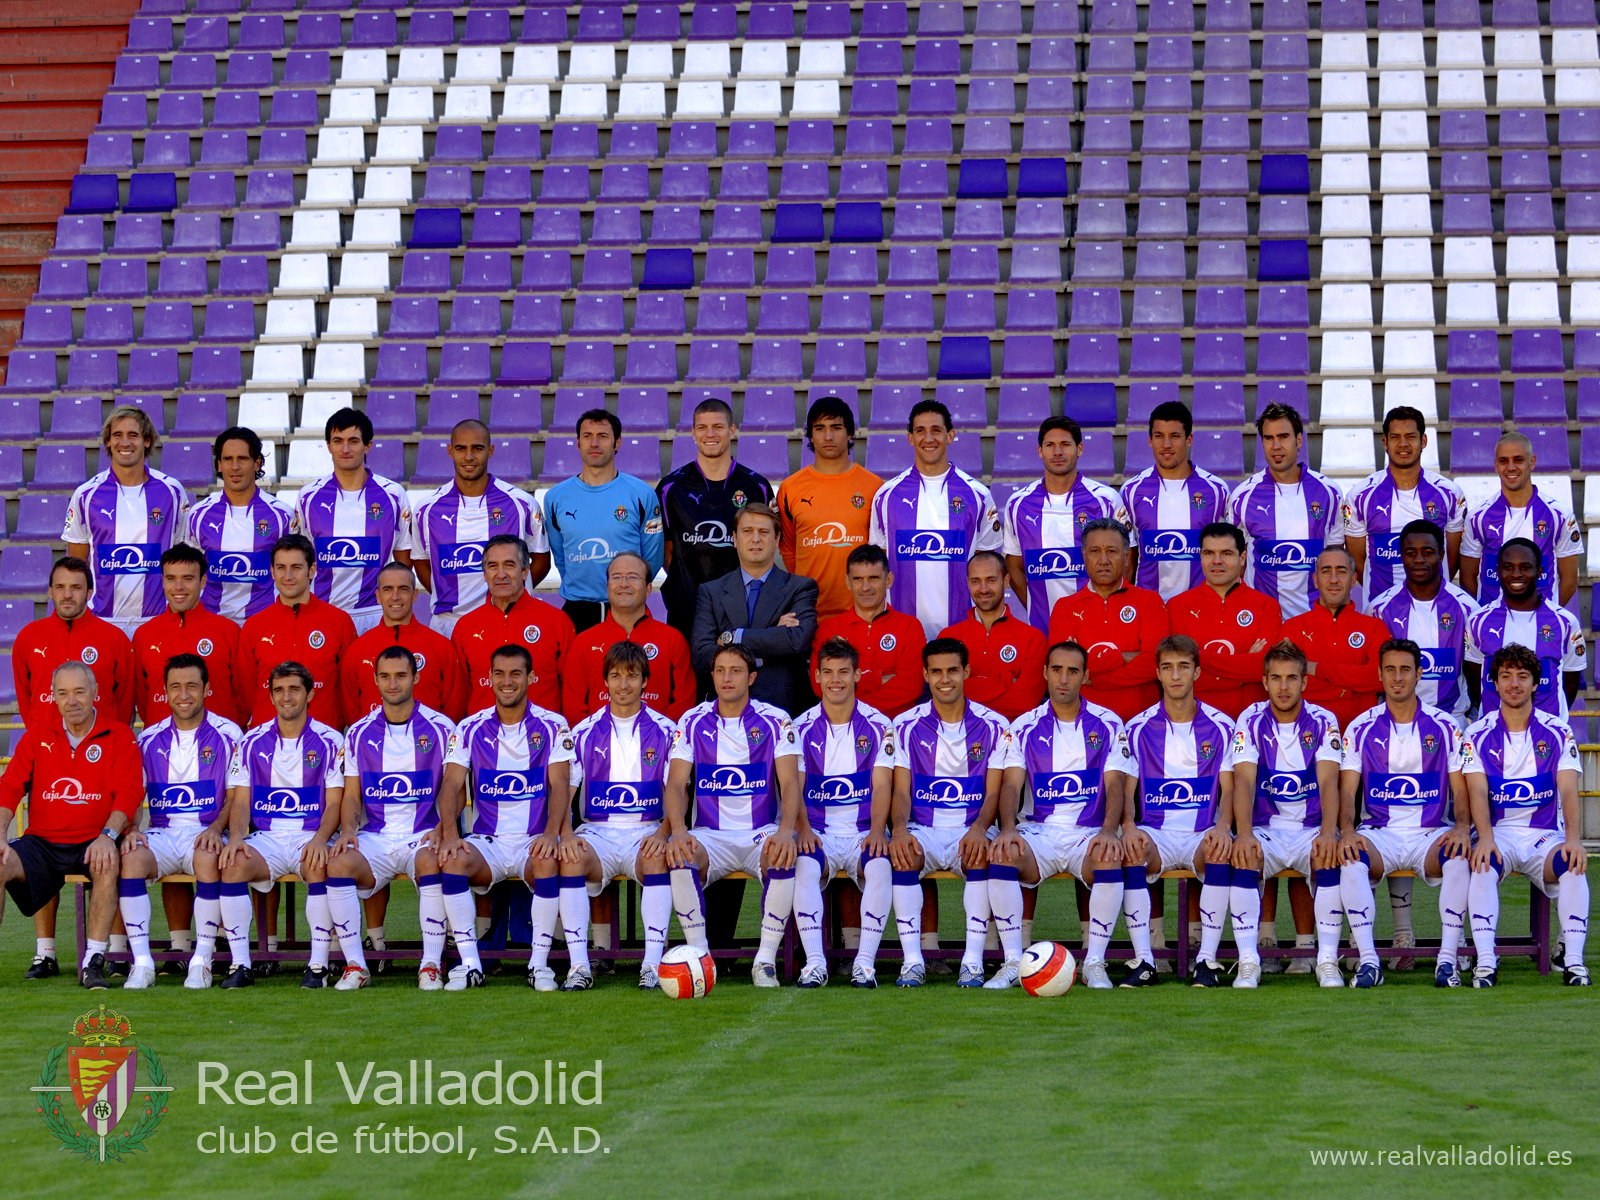 ¿Cuánto mide Sergio Asenjo? Valladolid%2B2007%2B08%2B01